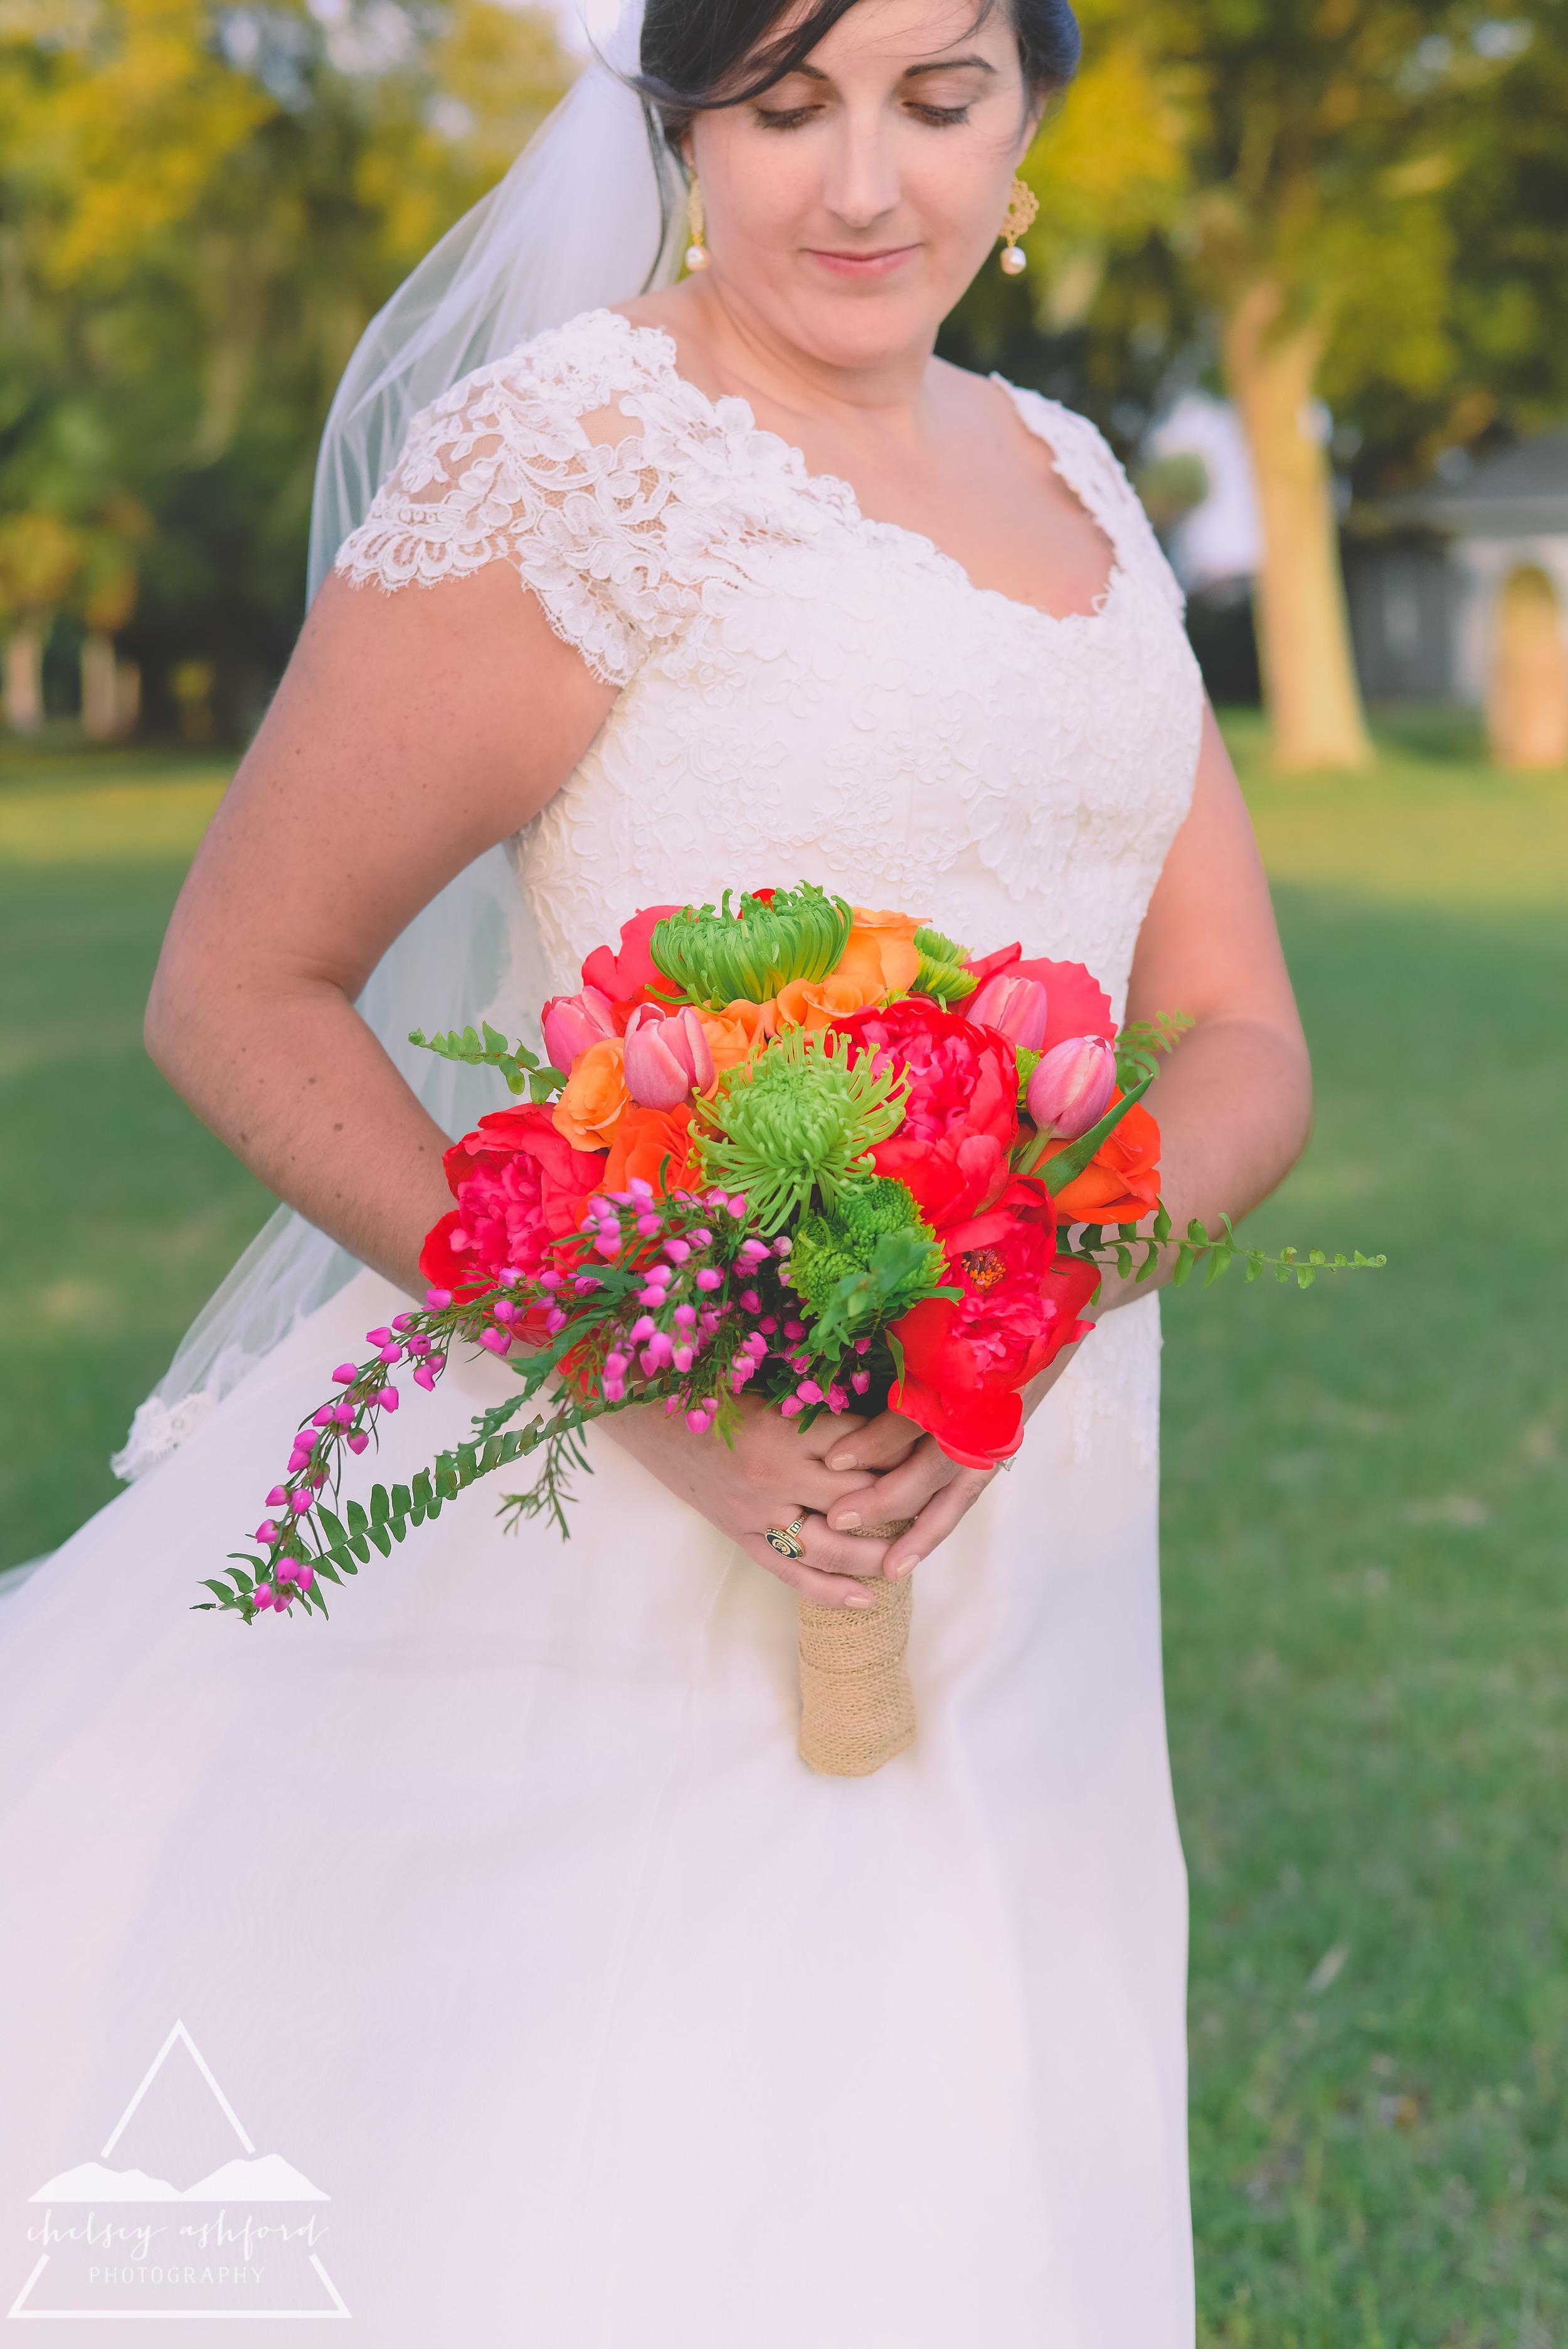 Sylvia_bridals_web-44.jpg